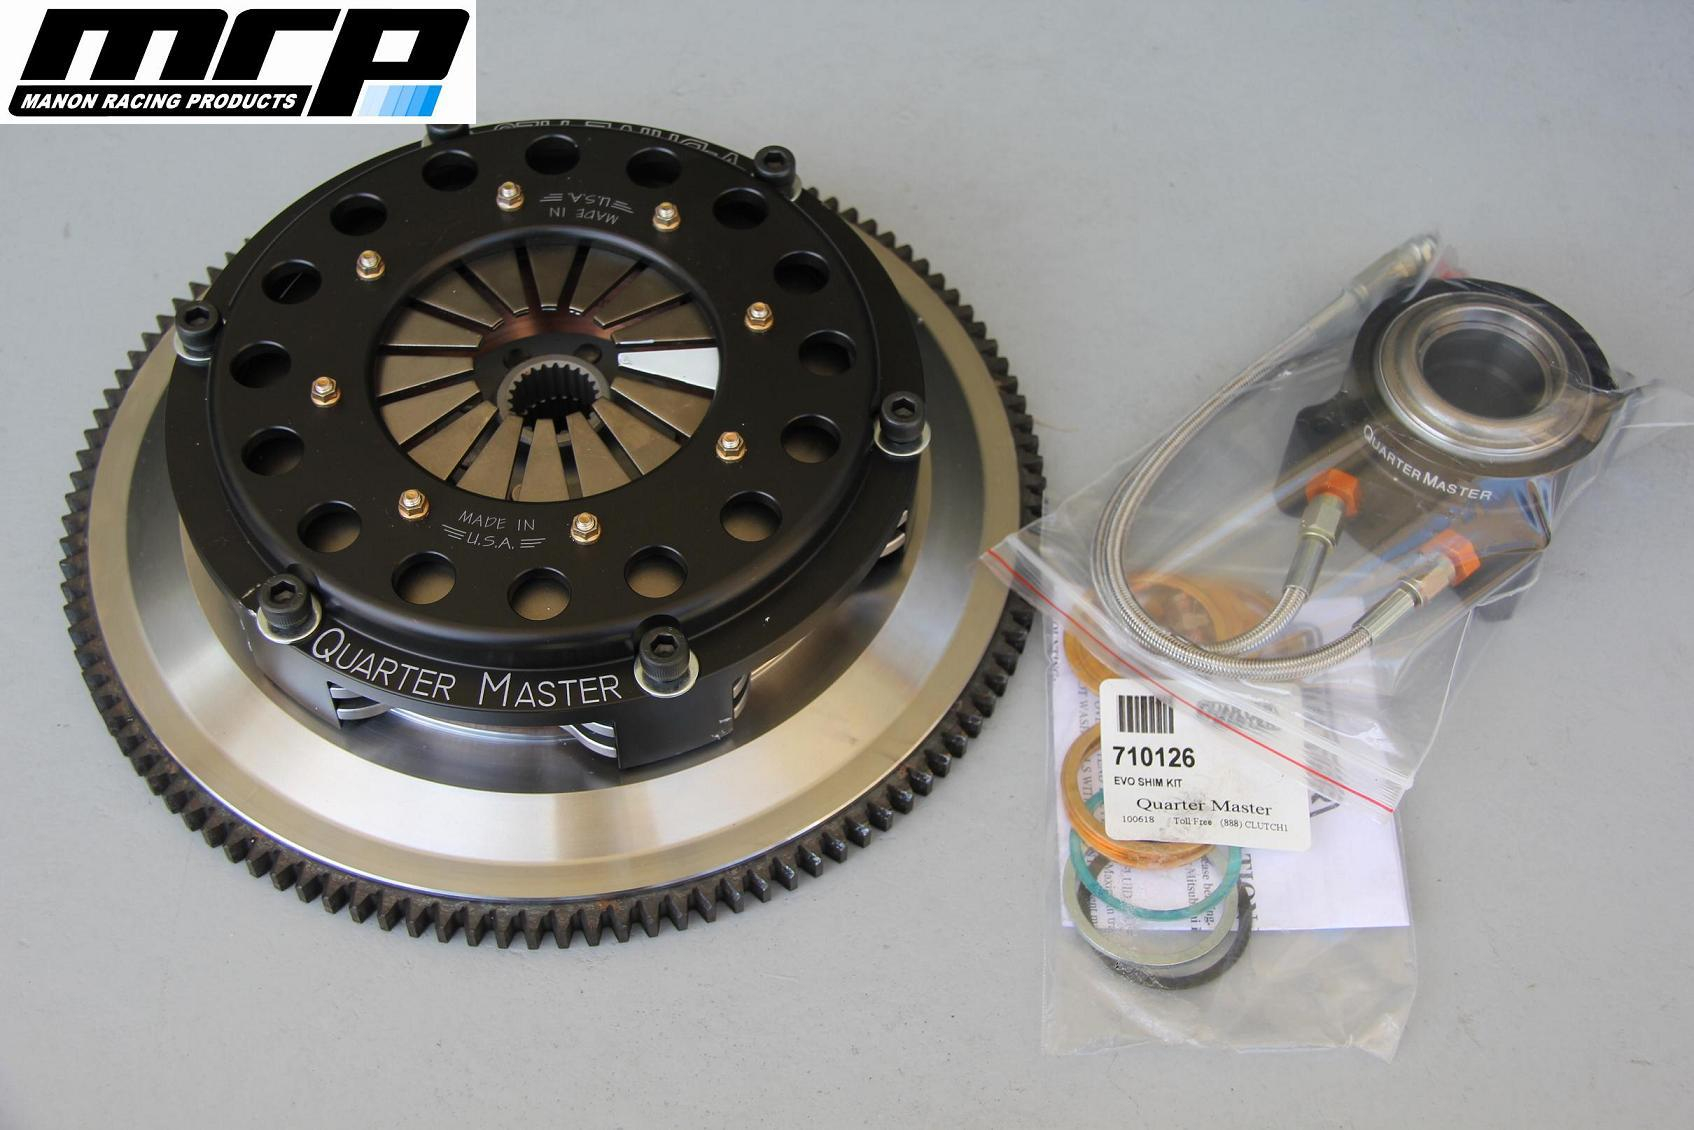 1e196f6042 Mitsubishi Evo 4-9 Twinplate Clutch Kit – Manon Racing Products